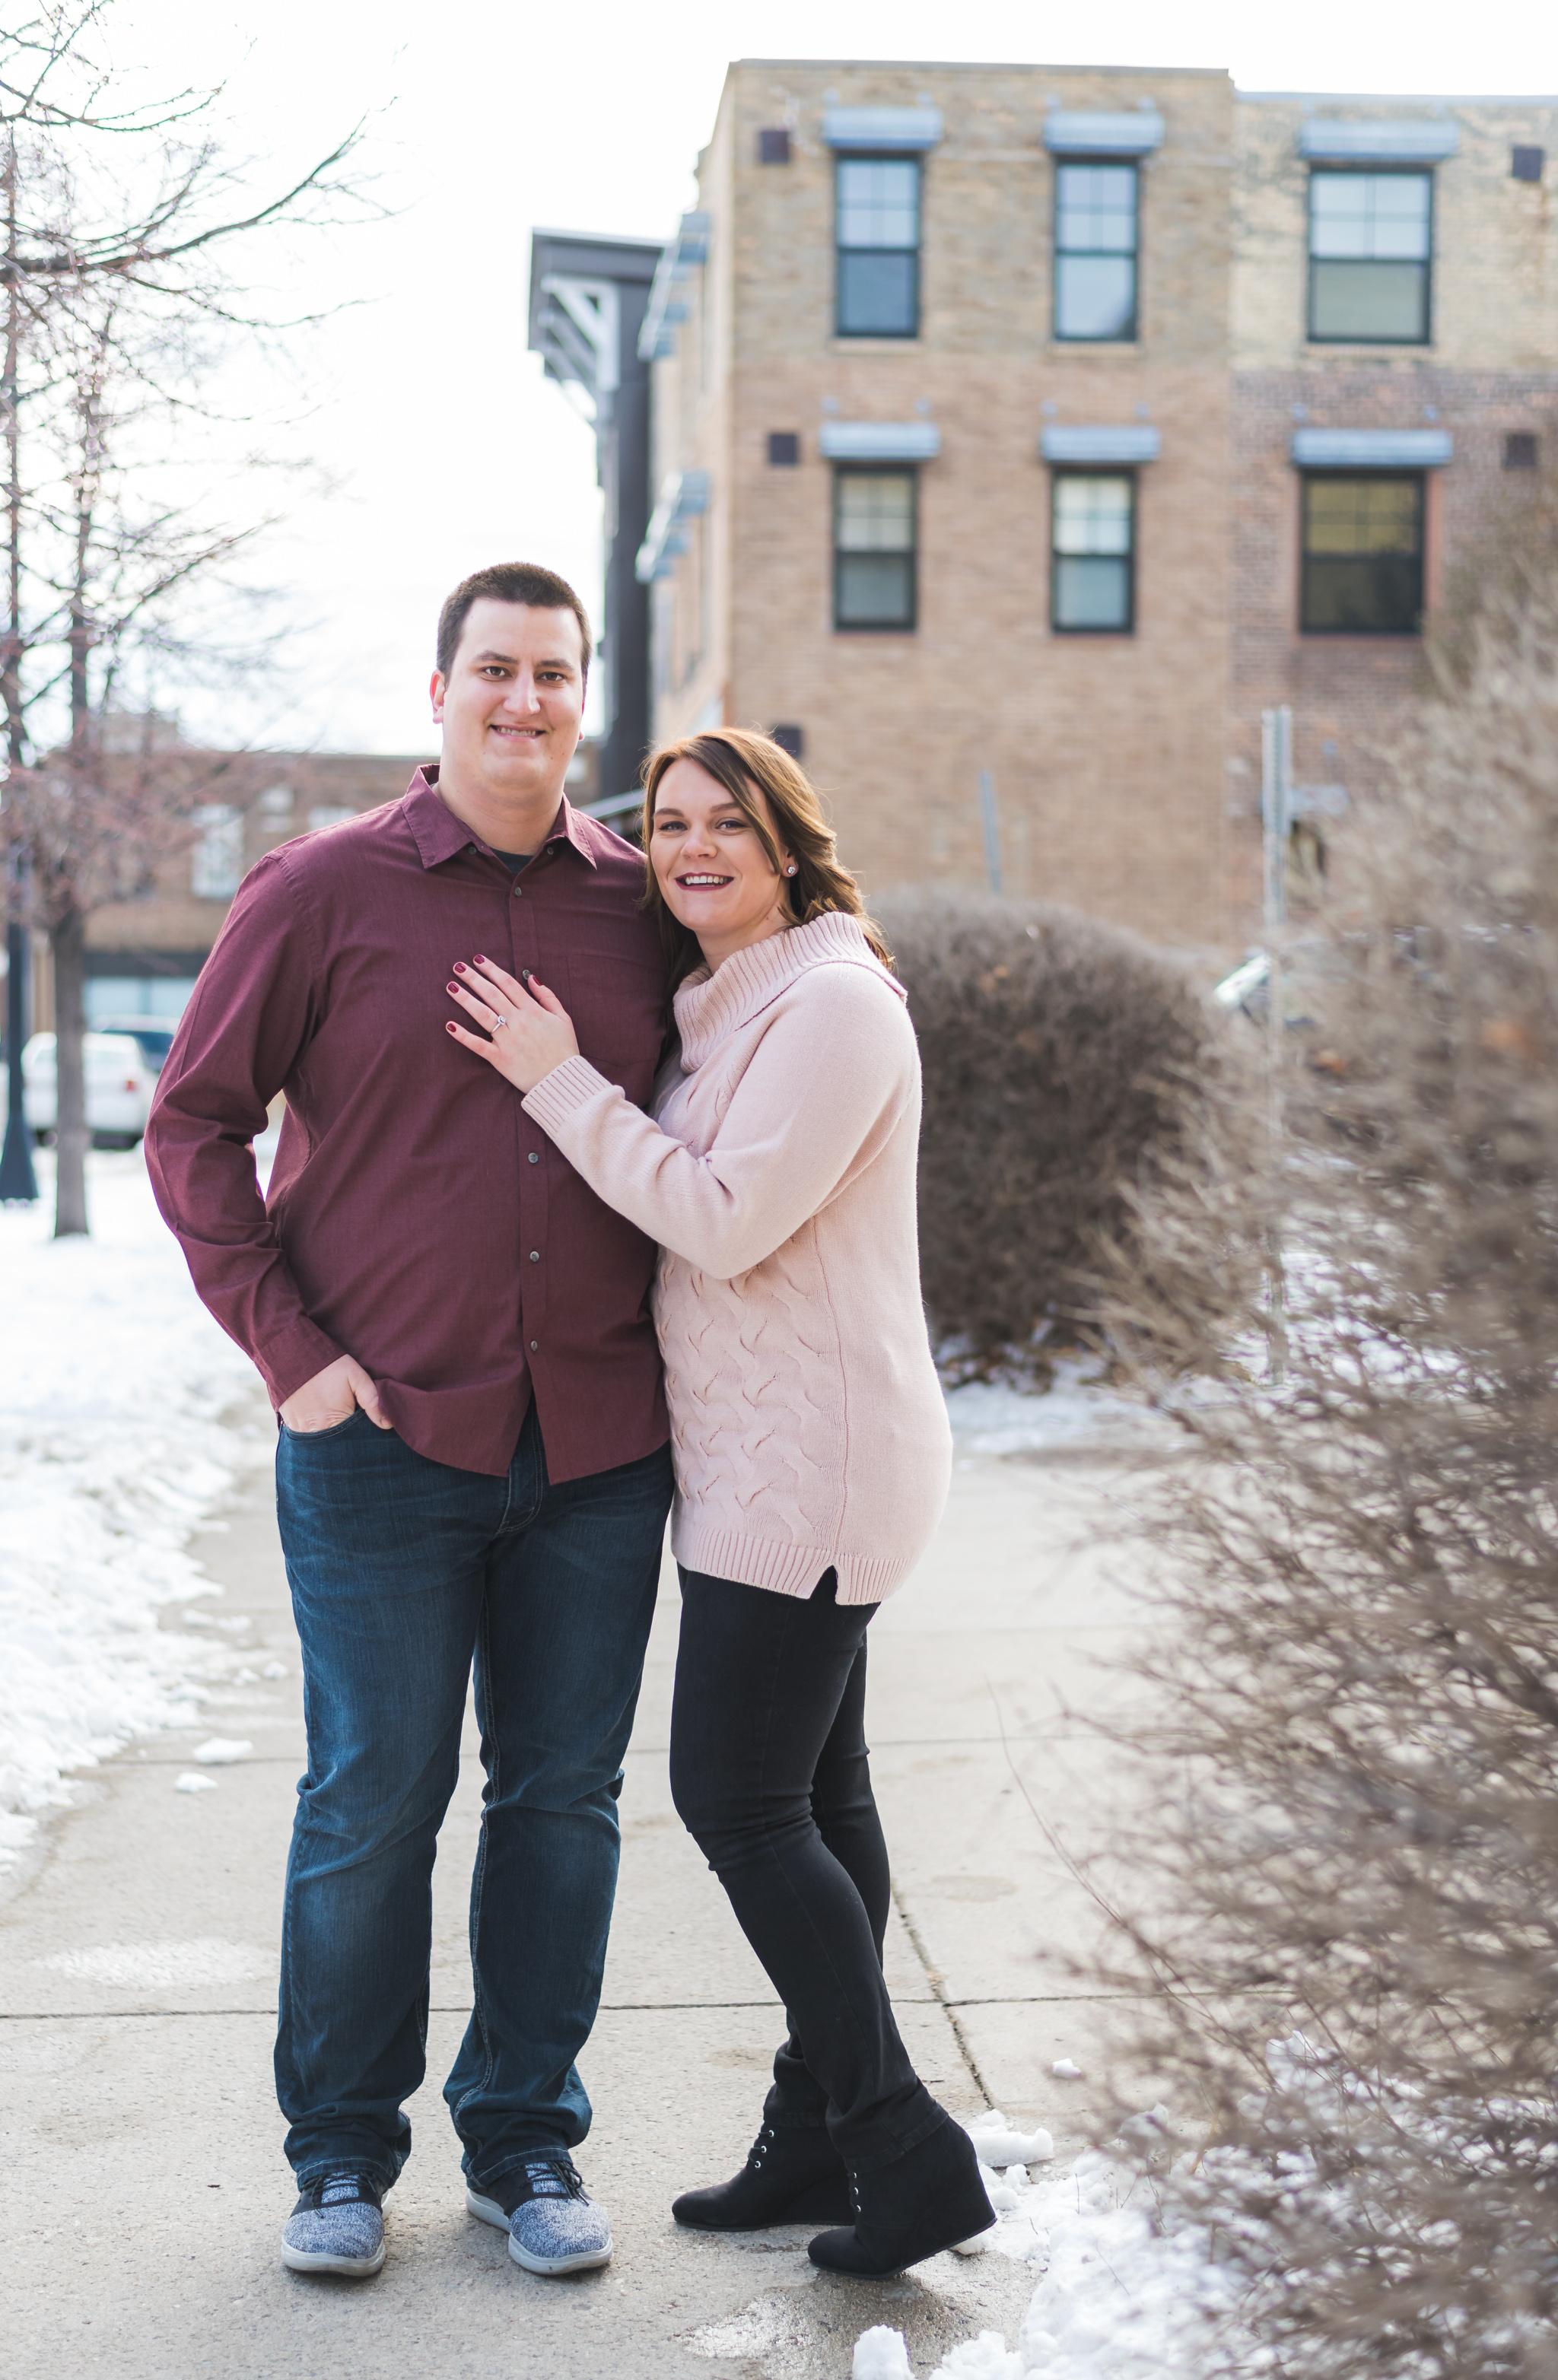 Downtown Fargo Engagement Pictures   Chelsea Joy Photography